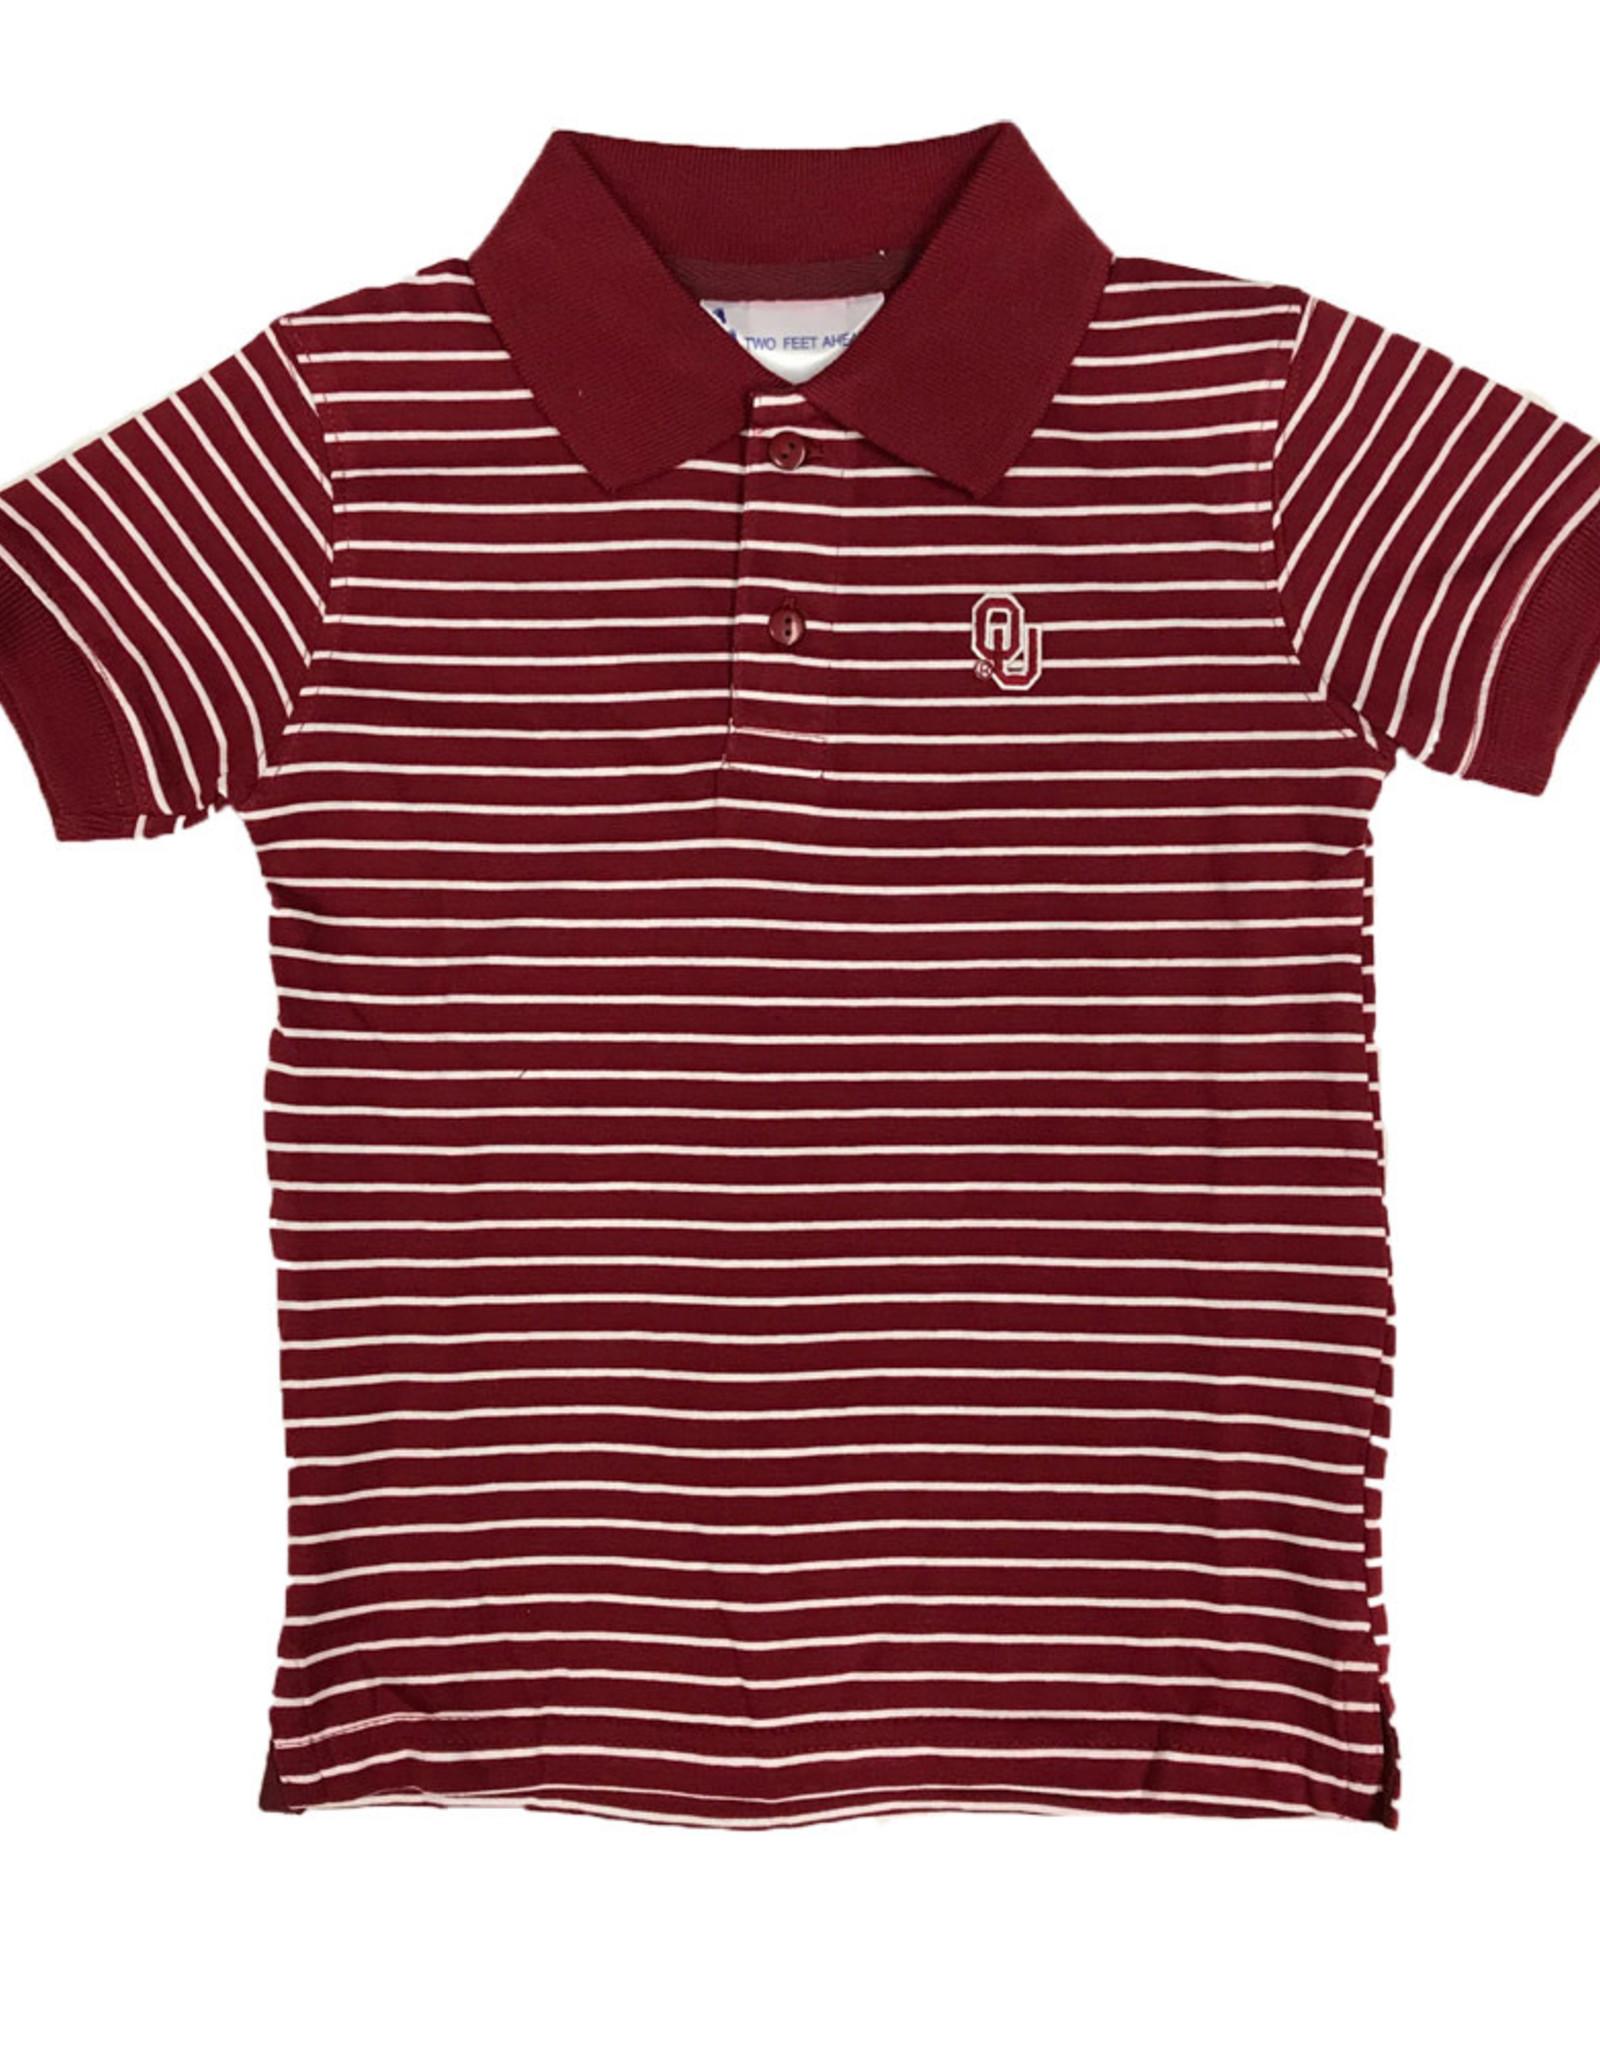 Two Feet Ahead Toddler OU Stripe Jersey Golf Shirt